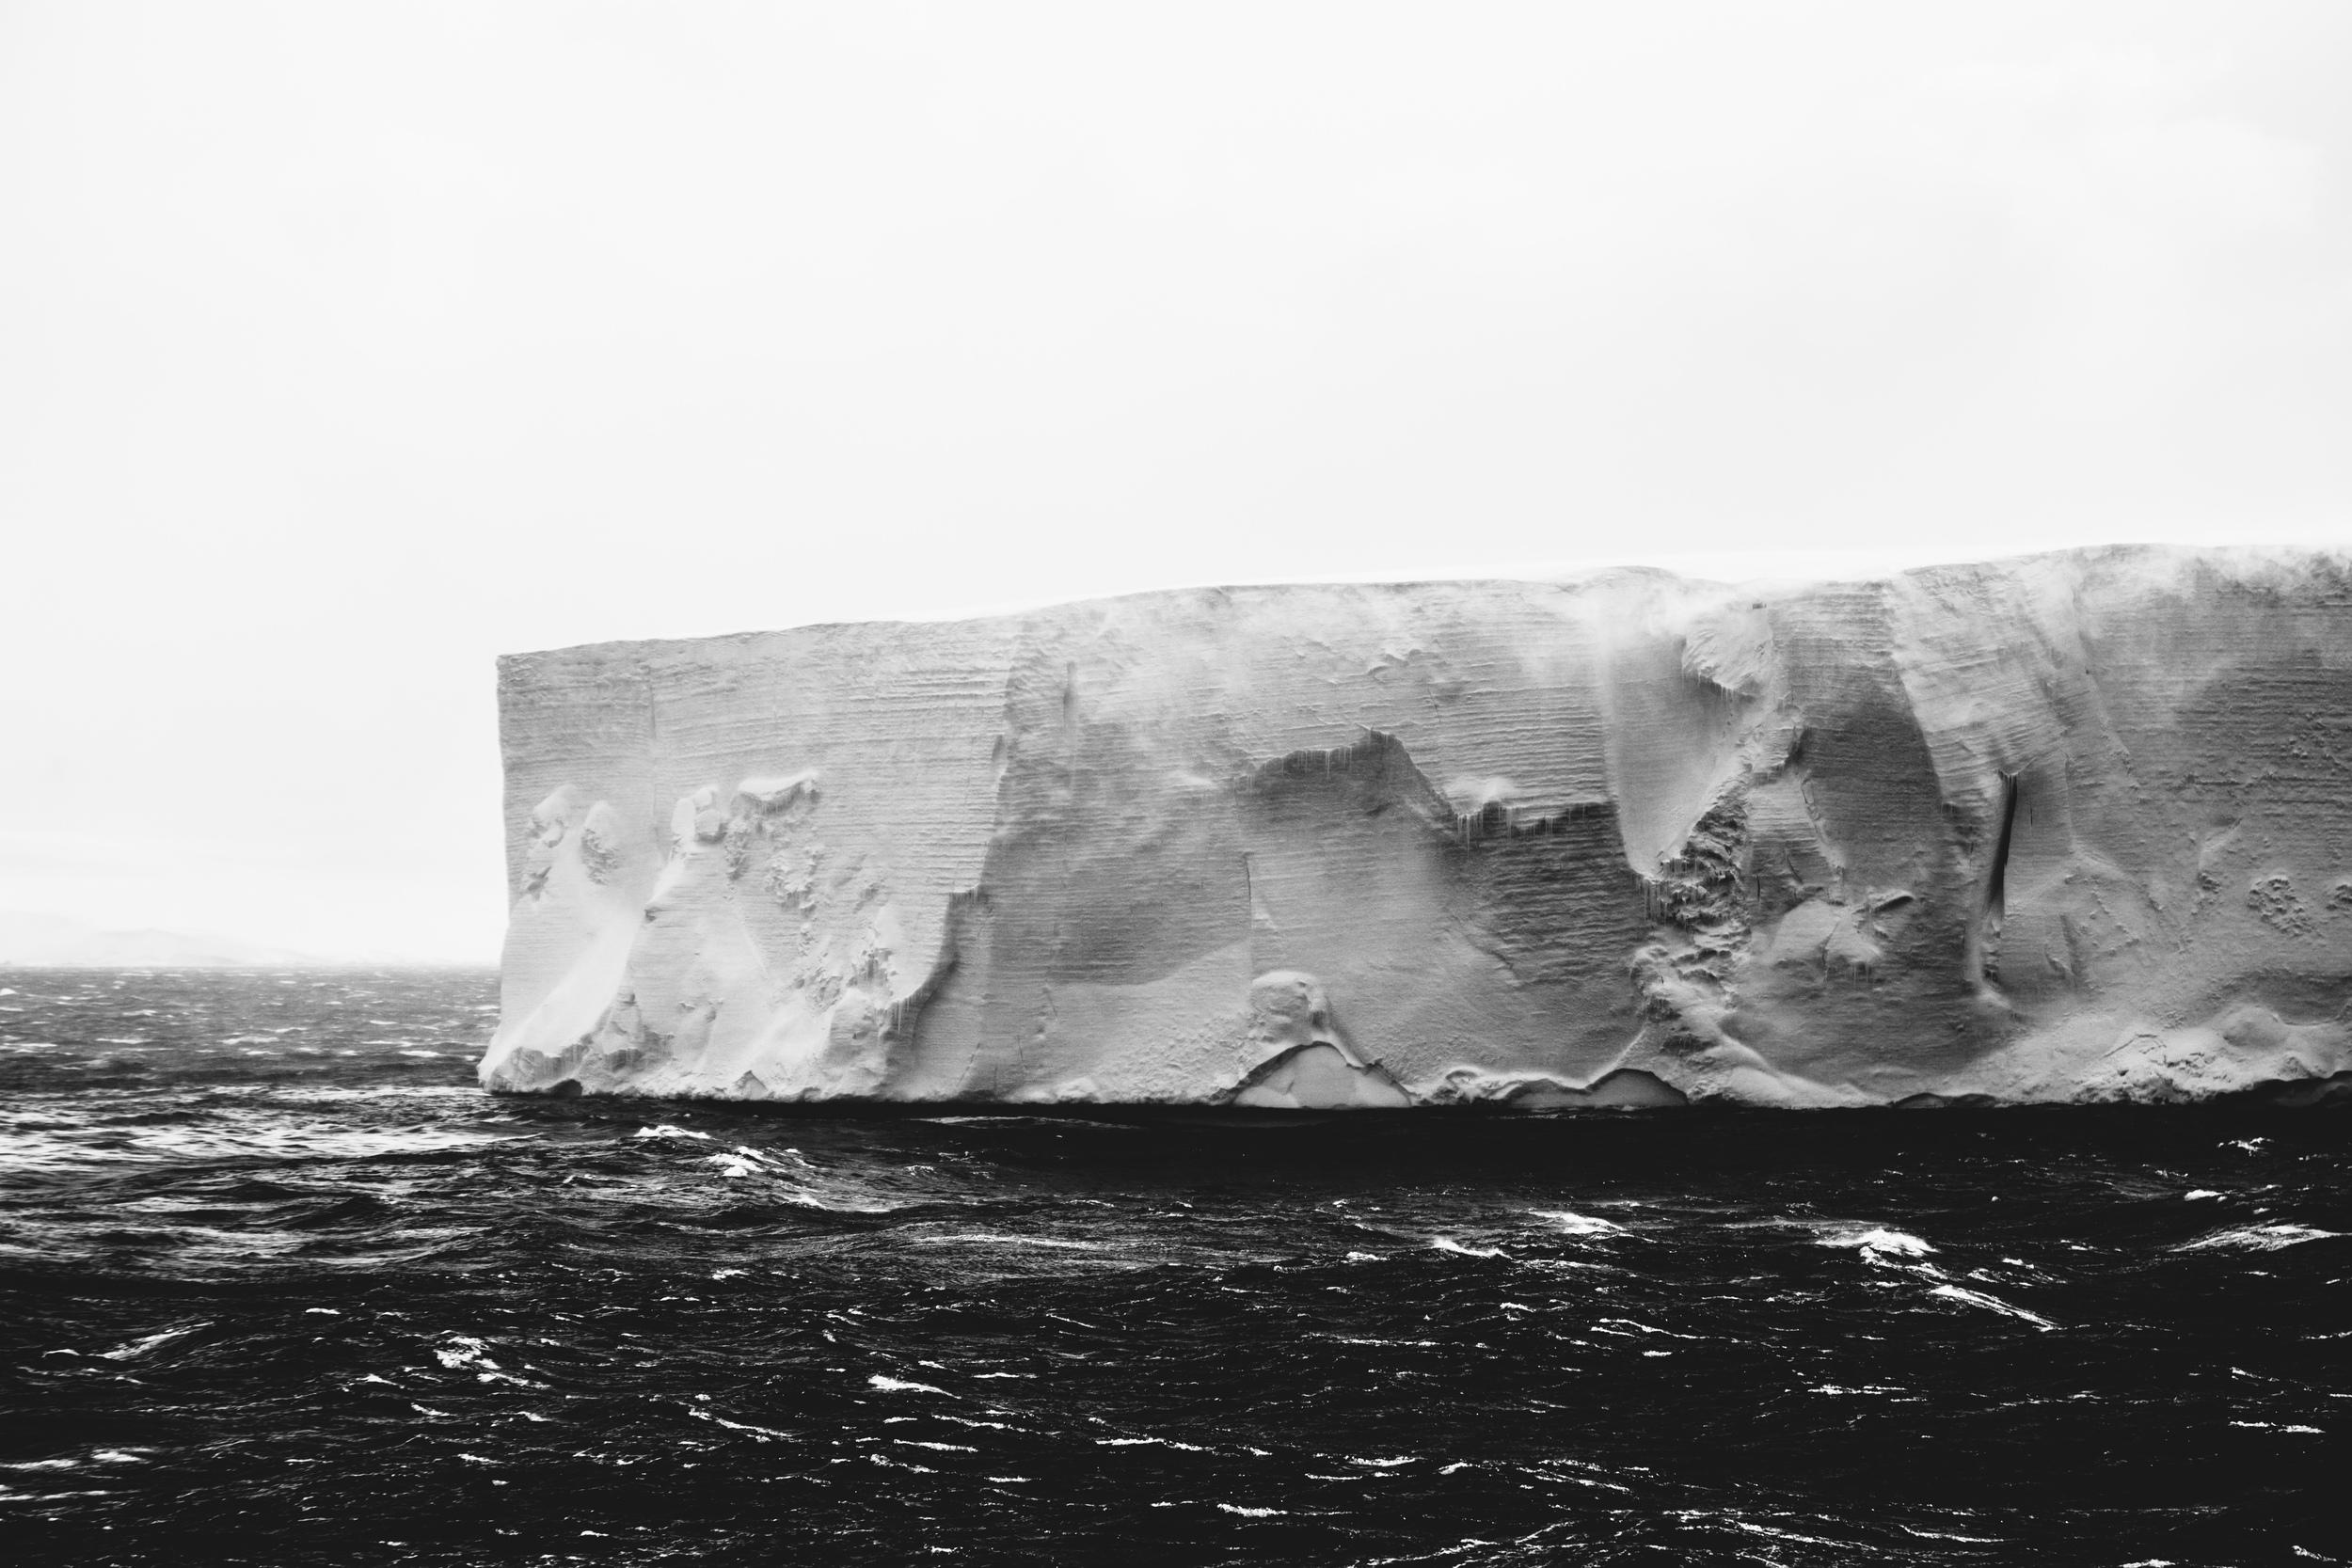 aqm-antarctica-noir-22.jpg